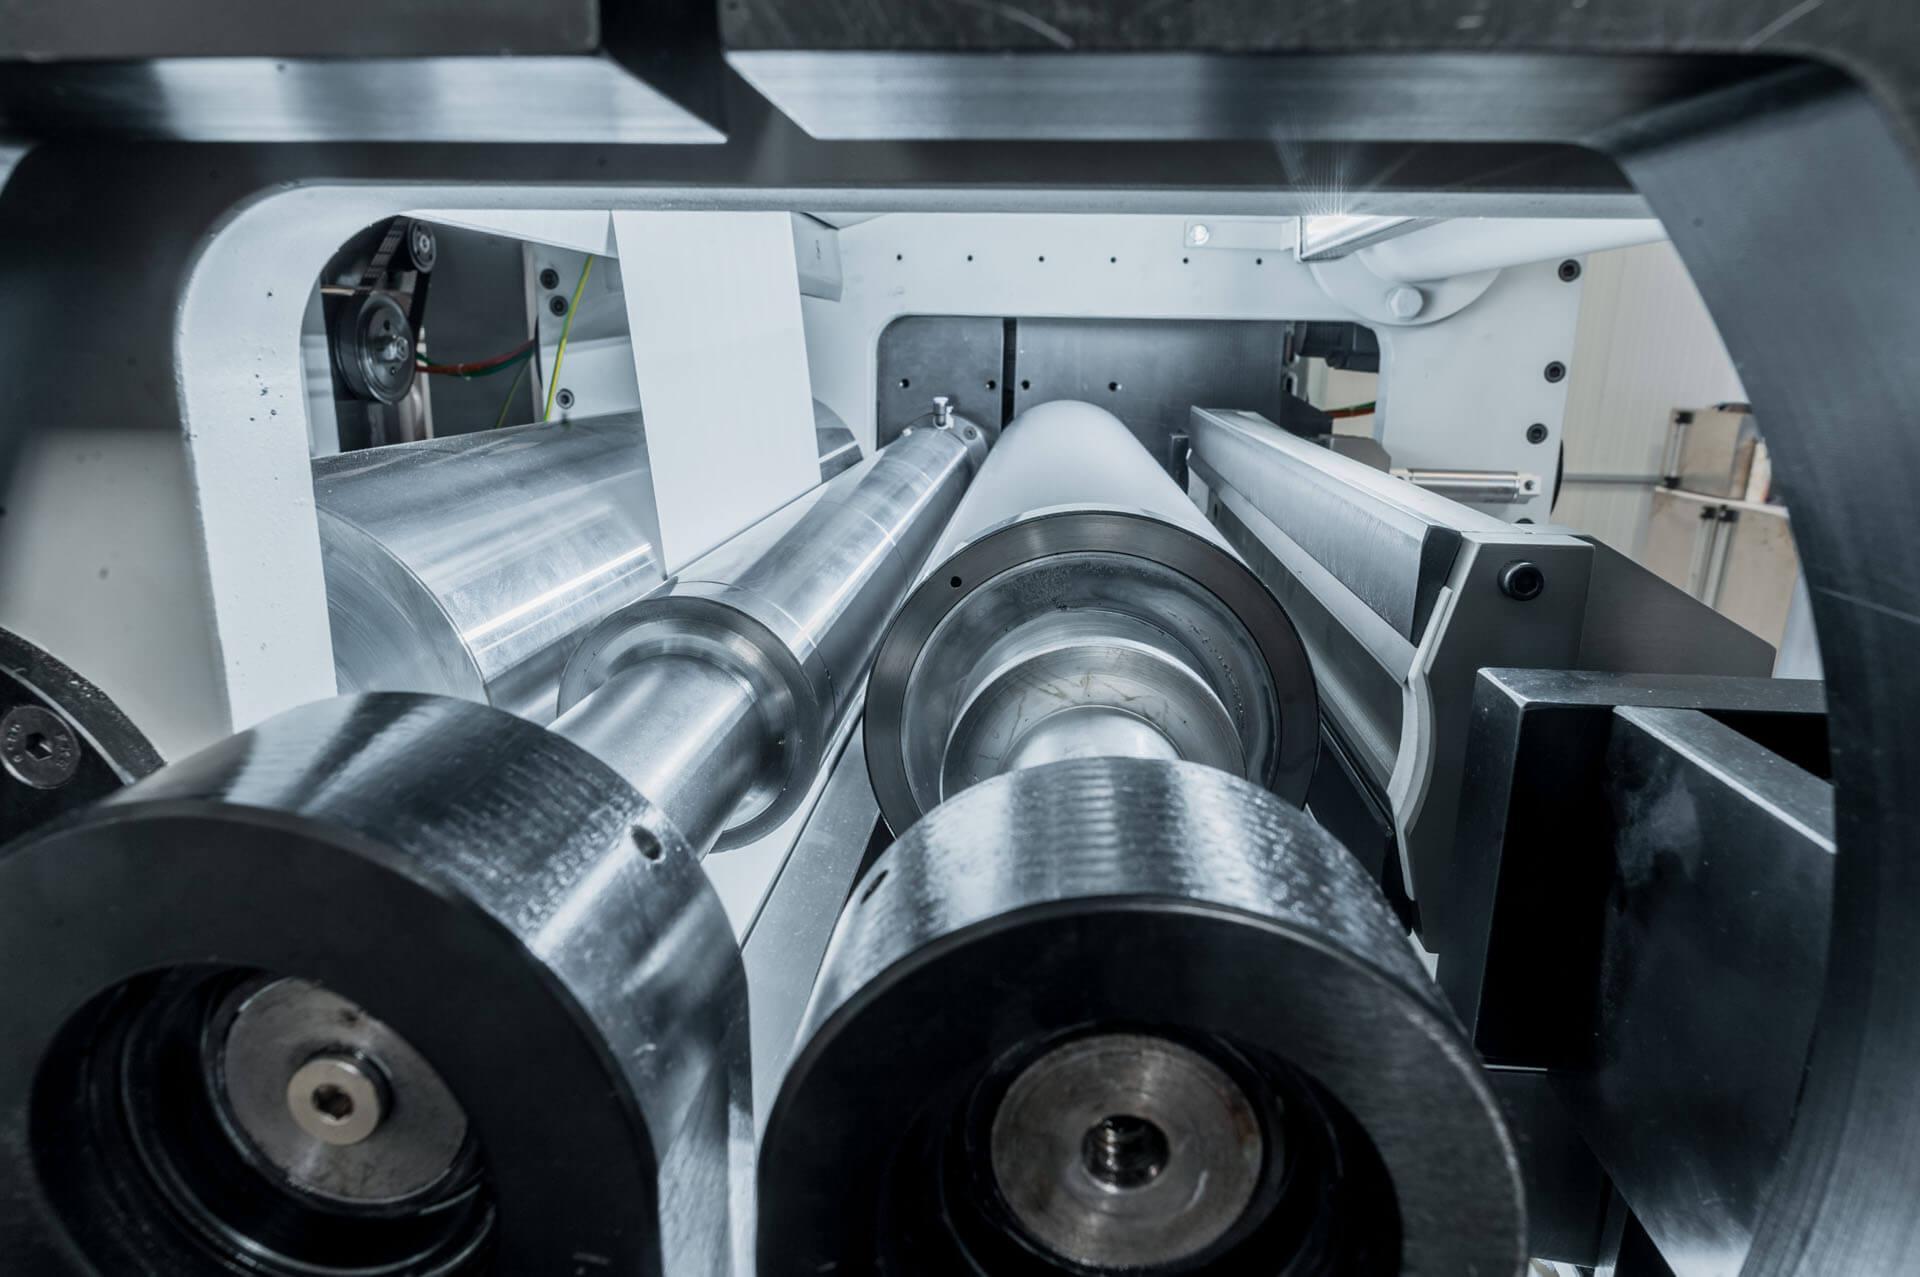 flexo-printing-machine-S10-vallis-03